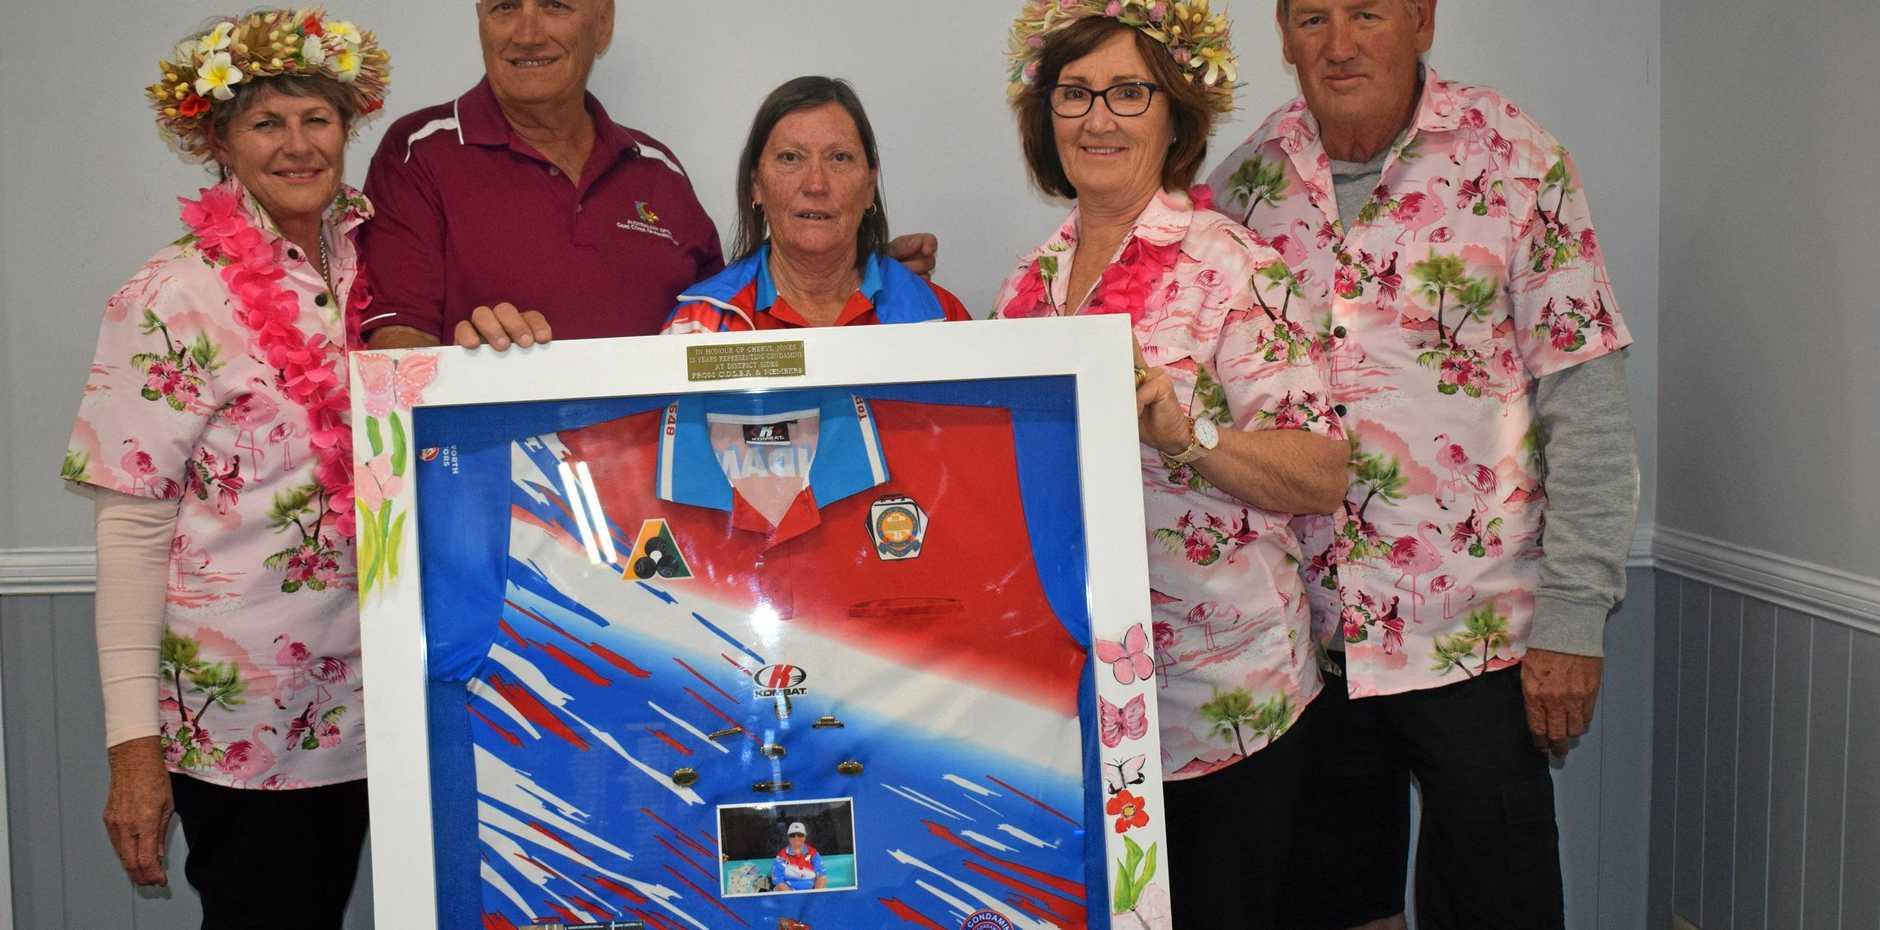 REMEBERING: Julie and Peter Jones, Margie Read, Bernette and Rob Nielsen get presented the memorabilia for Cheryl Jones.